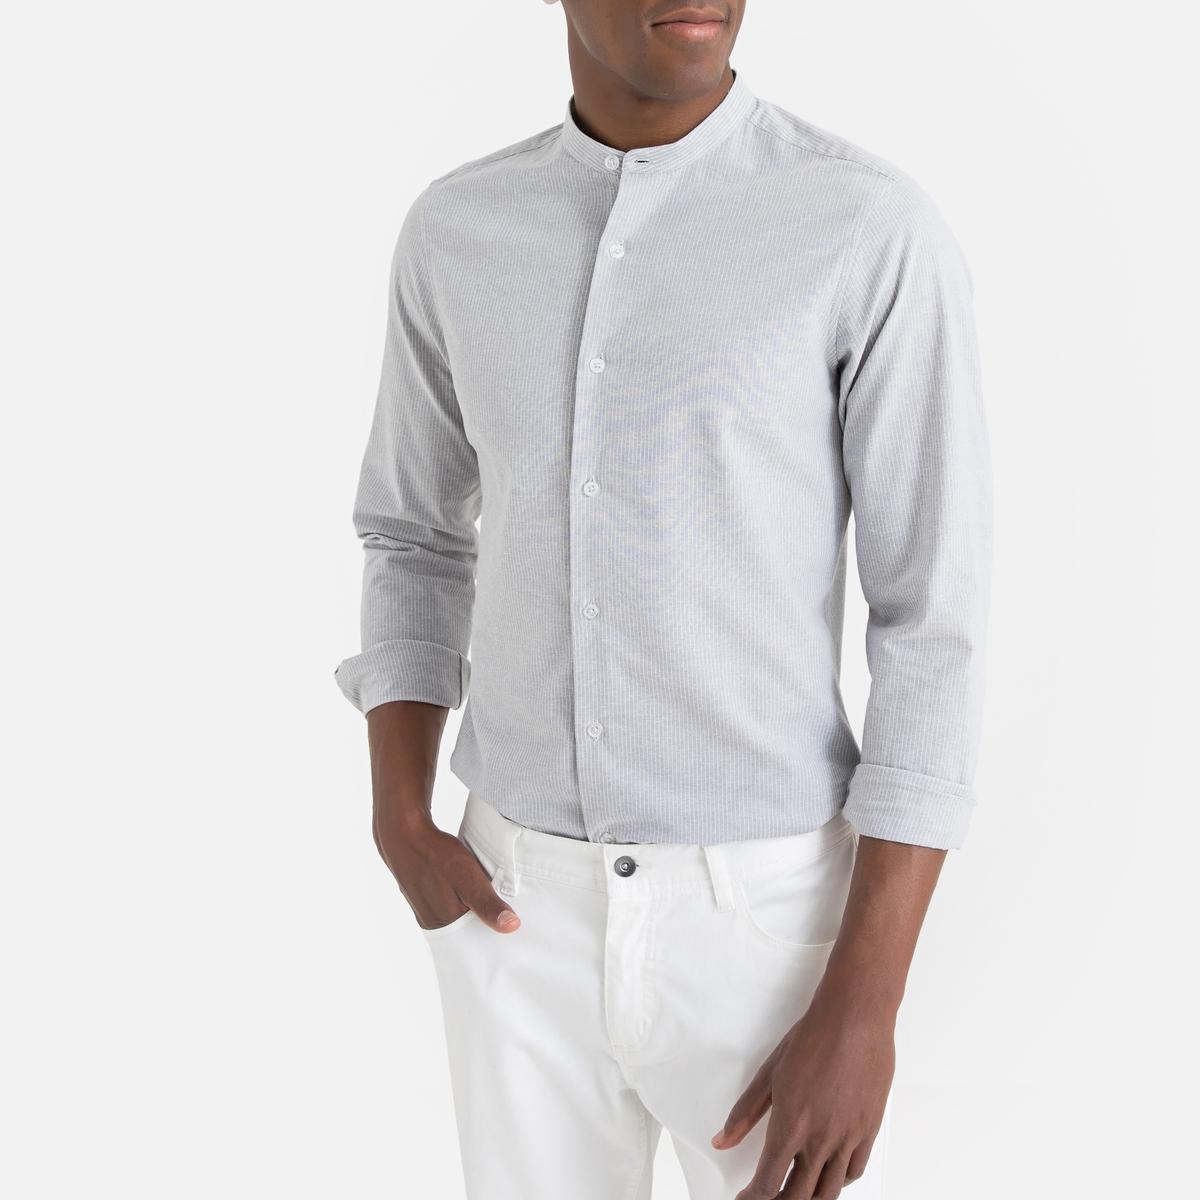 Camisa con cuello Mao de rayas finas, manga larga